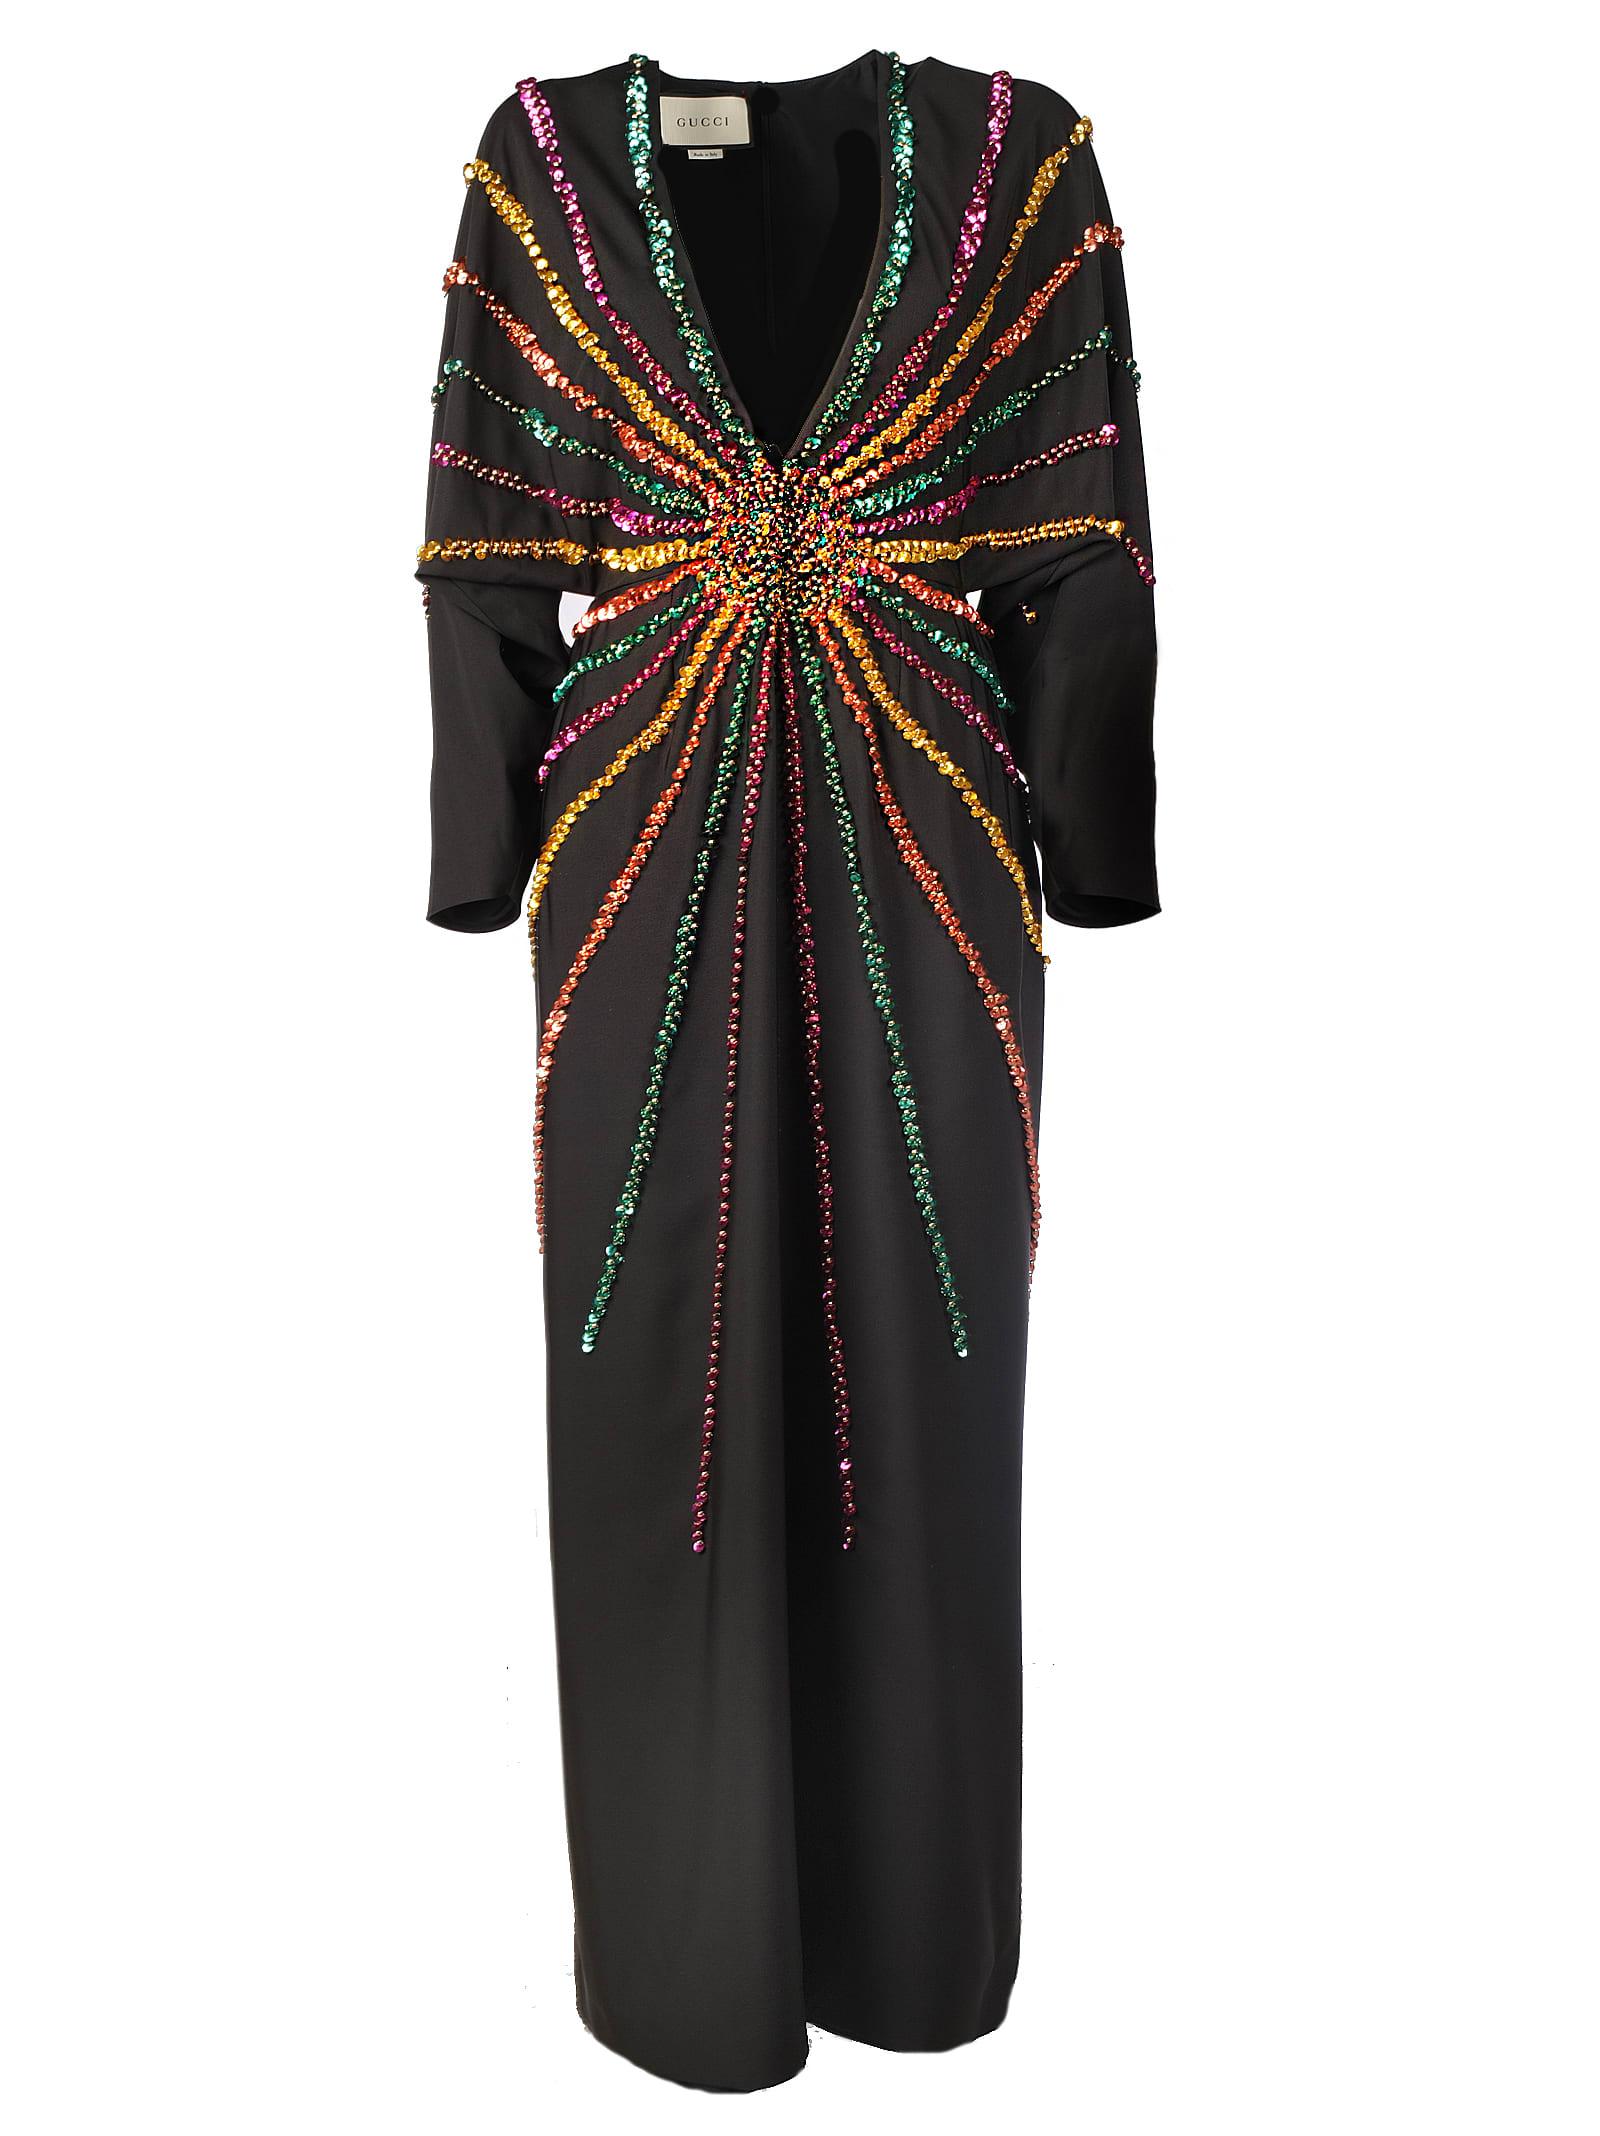 1bded31e5 Gucci Gucci Crystal Embellished Dress - Black - 10827755 | italist